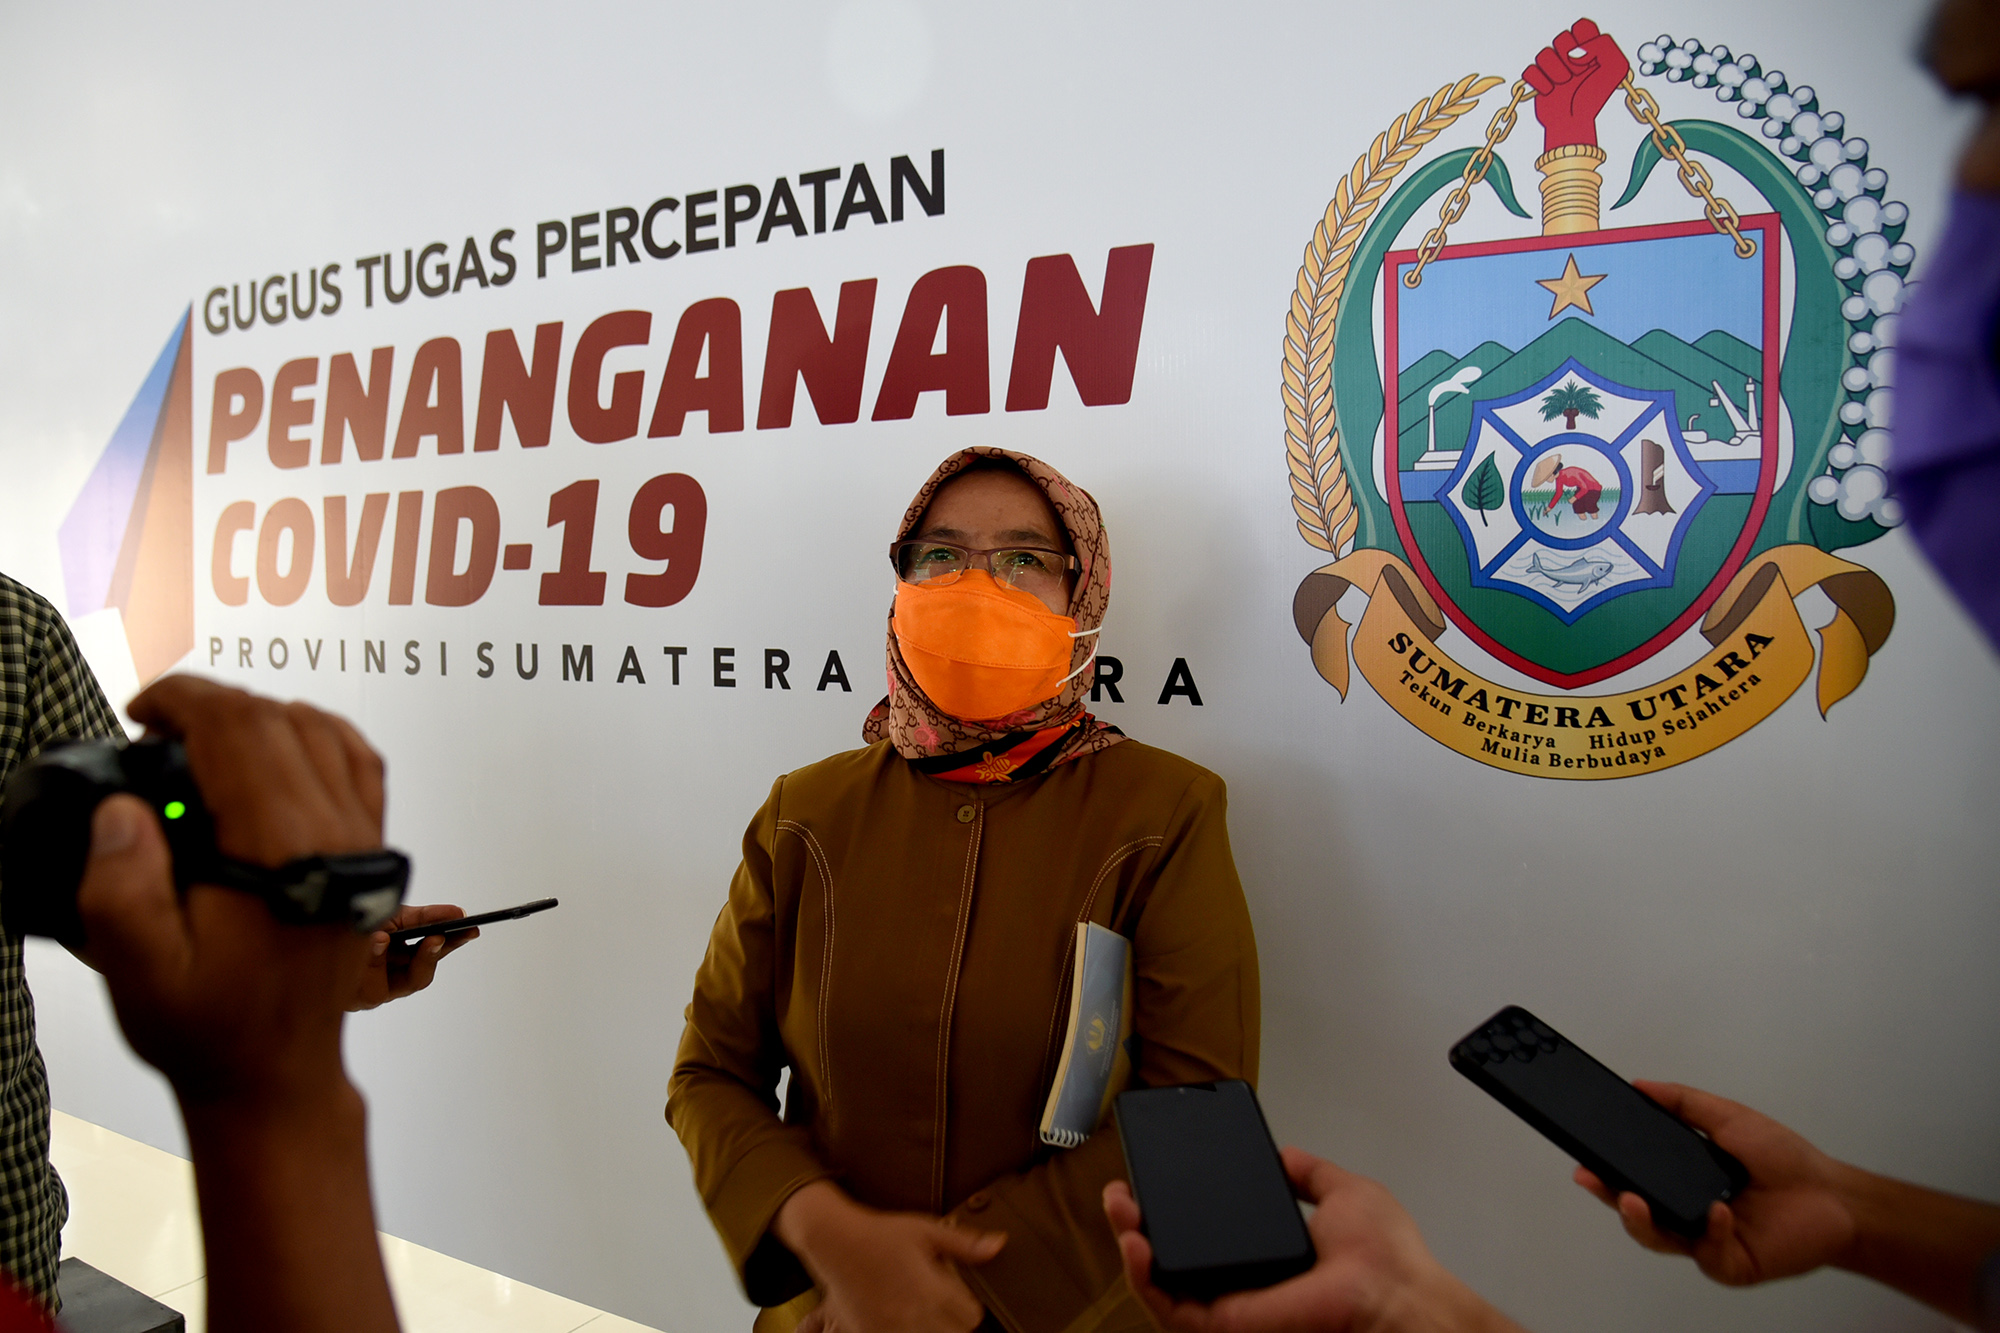 Sekertaris Daerah Provinsi Sumatera Utara R Sabrina. Foto: Biro Humas & Keprotokolan Setdaprovsu / Fahmi Aulia